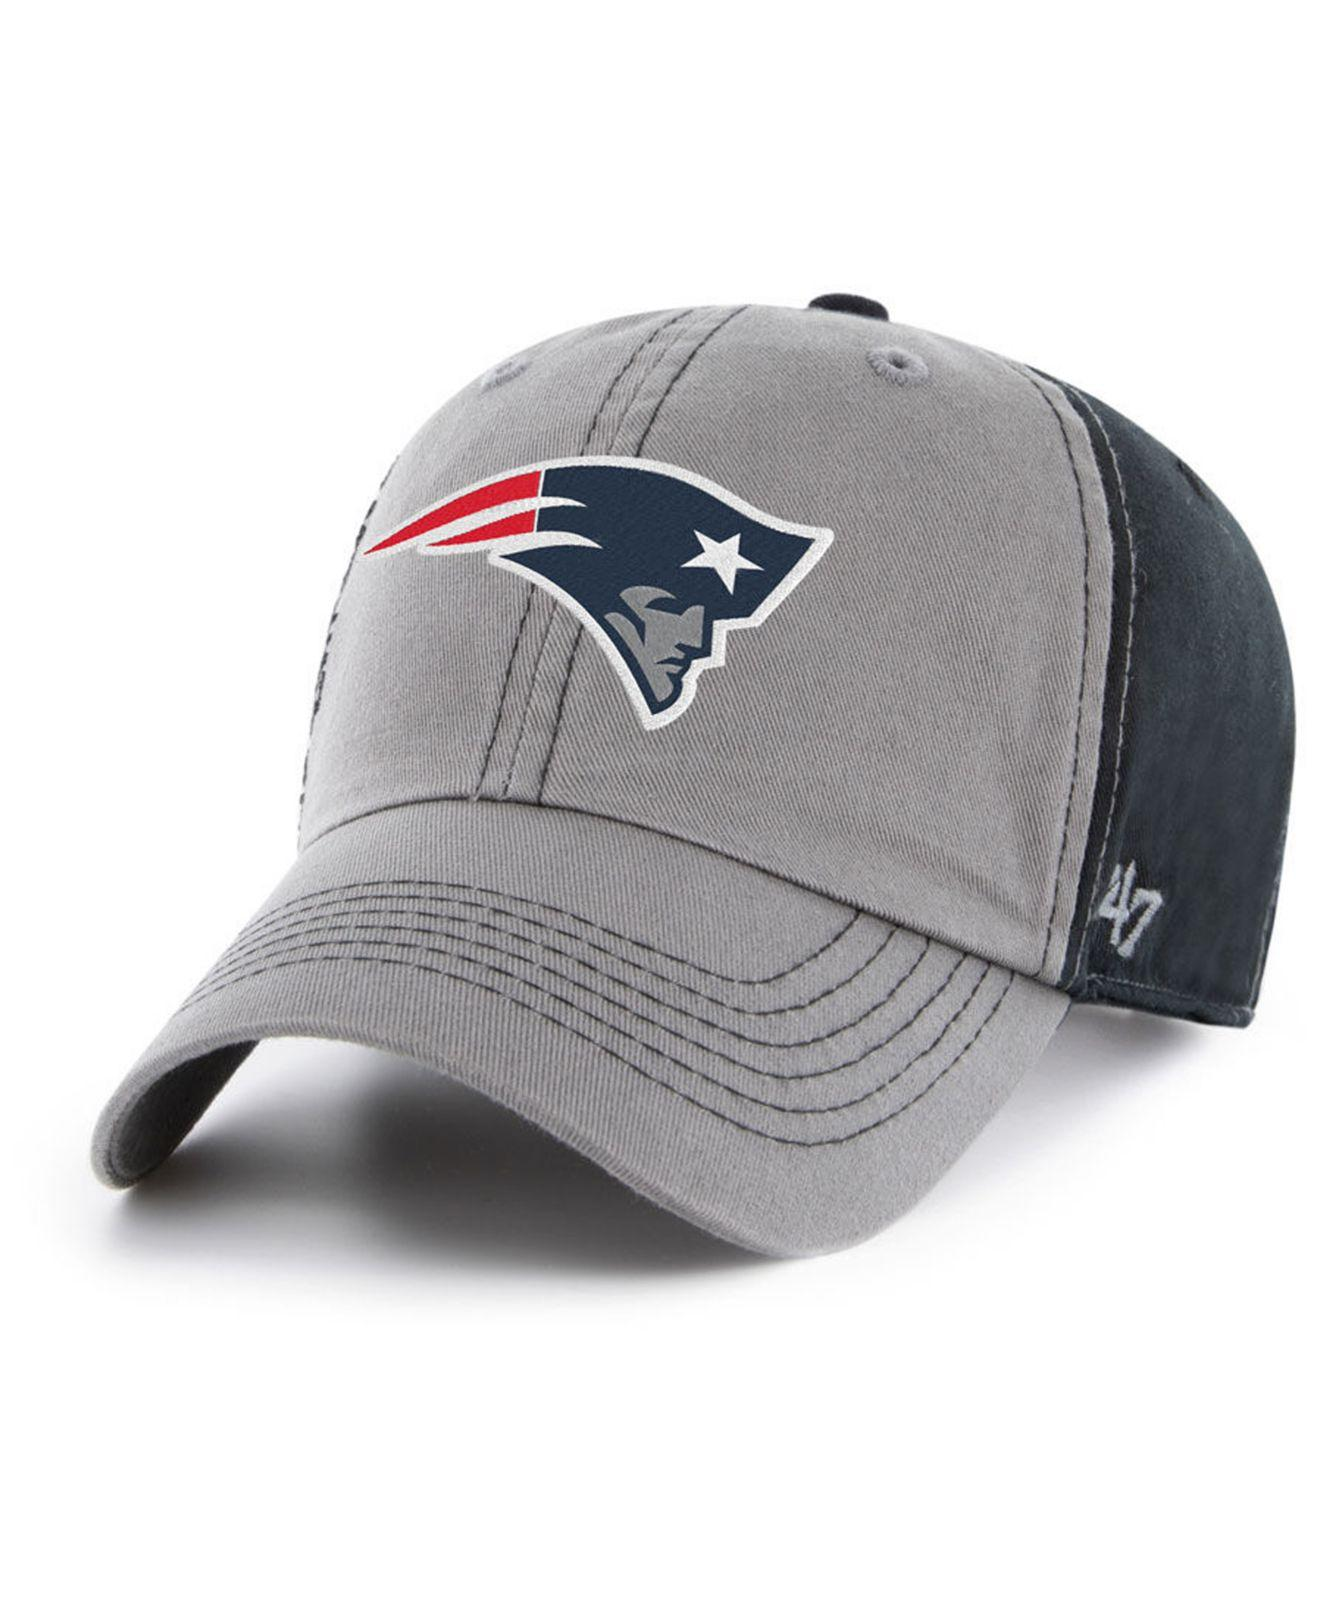 da740a060 Lyst - 47 Brand New England Patriots Super Bowl Liii Climb Clean Up ...